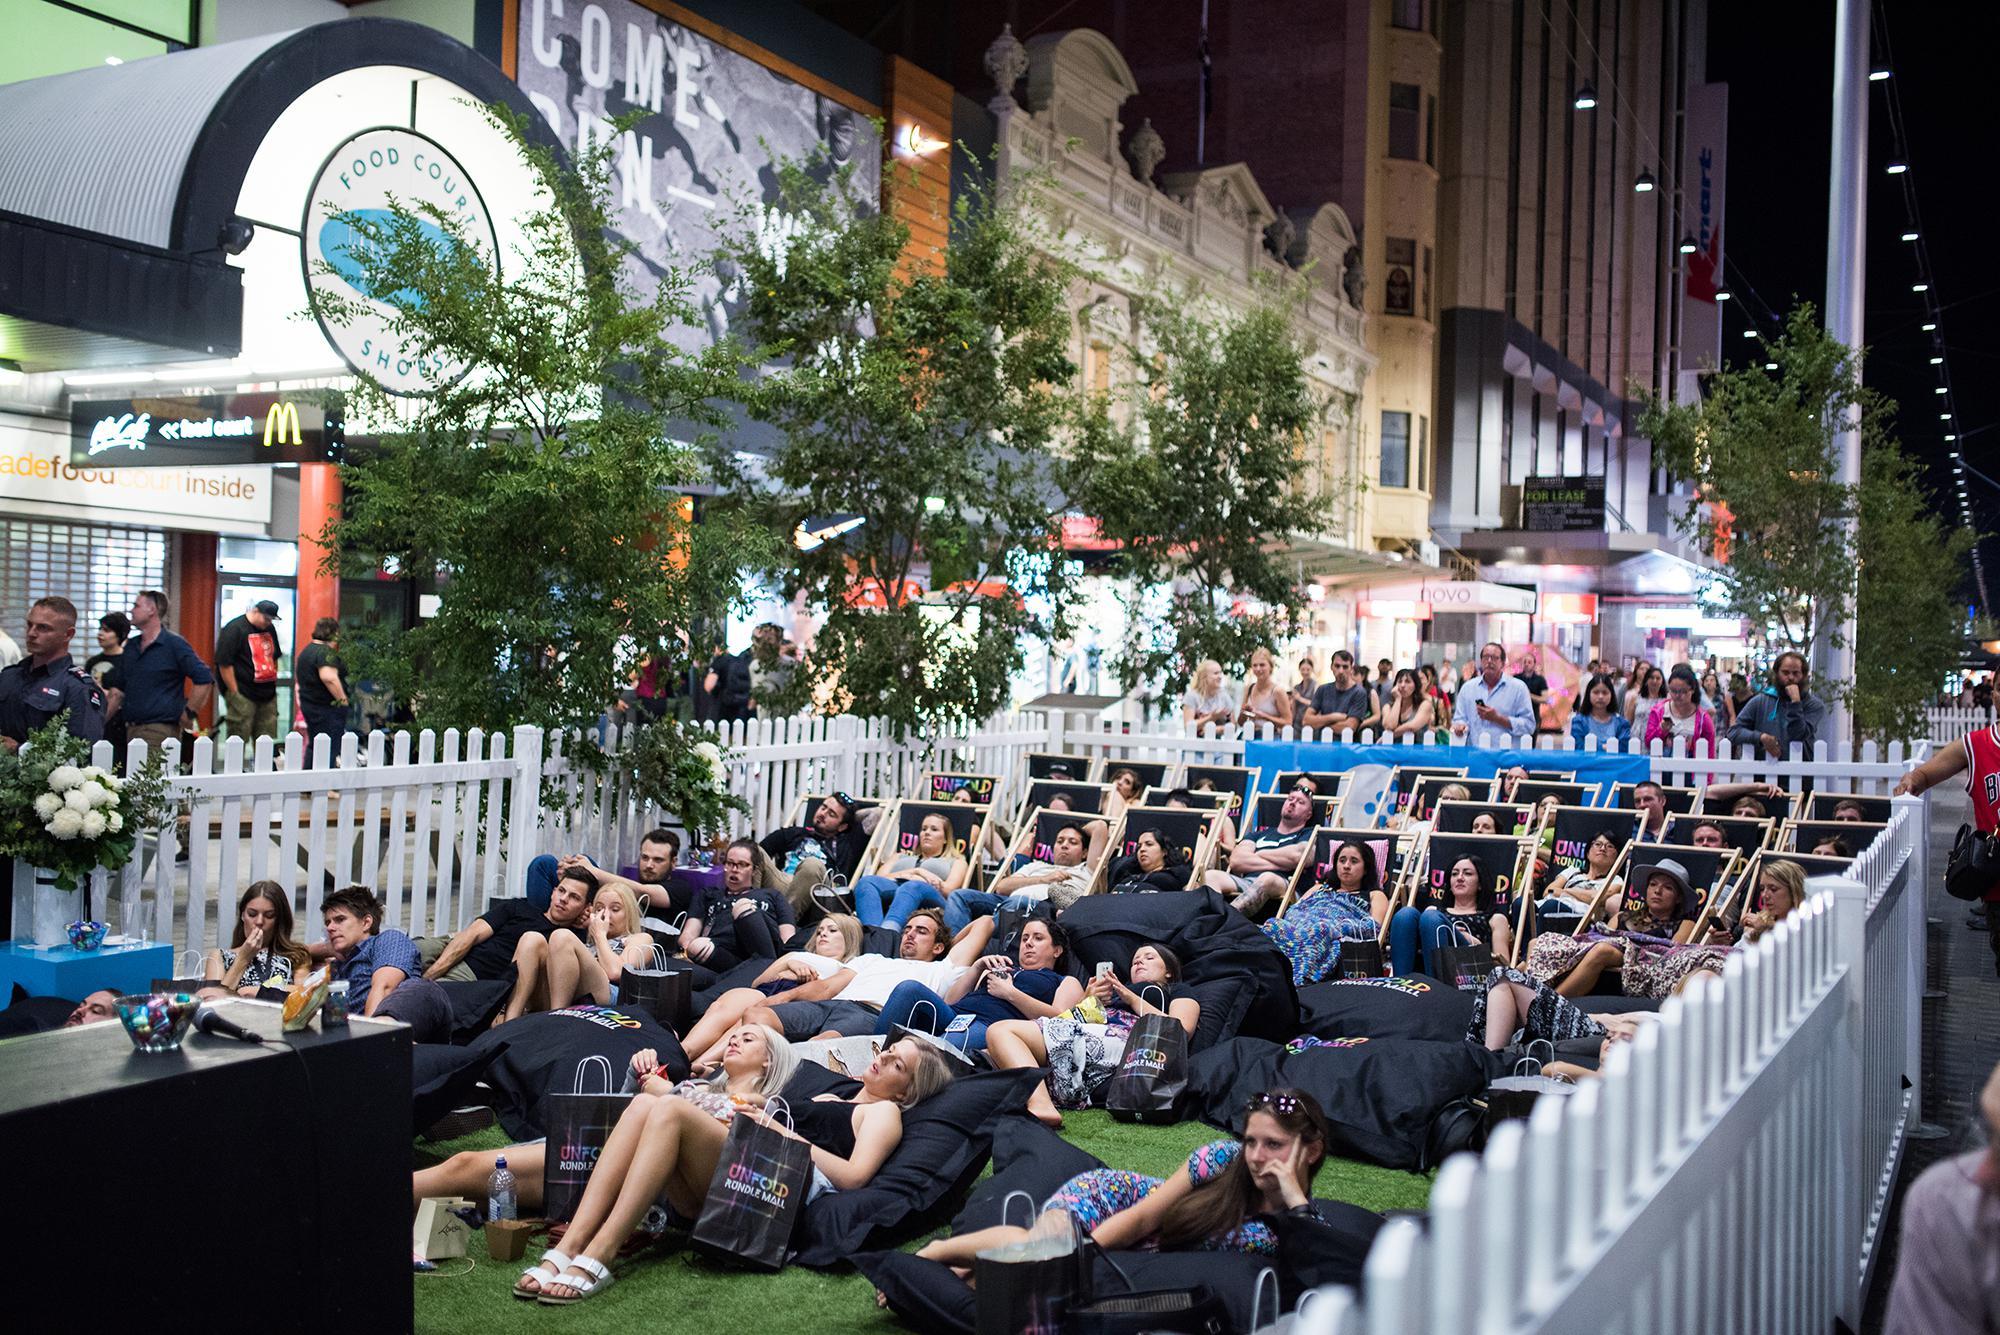 Rundle-Mall-night-cinema-Photographer-Duy-Dash-Courtesy-RMMA